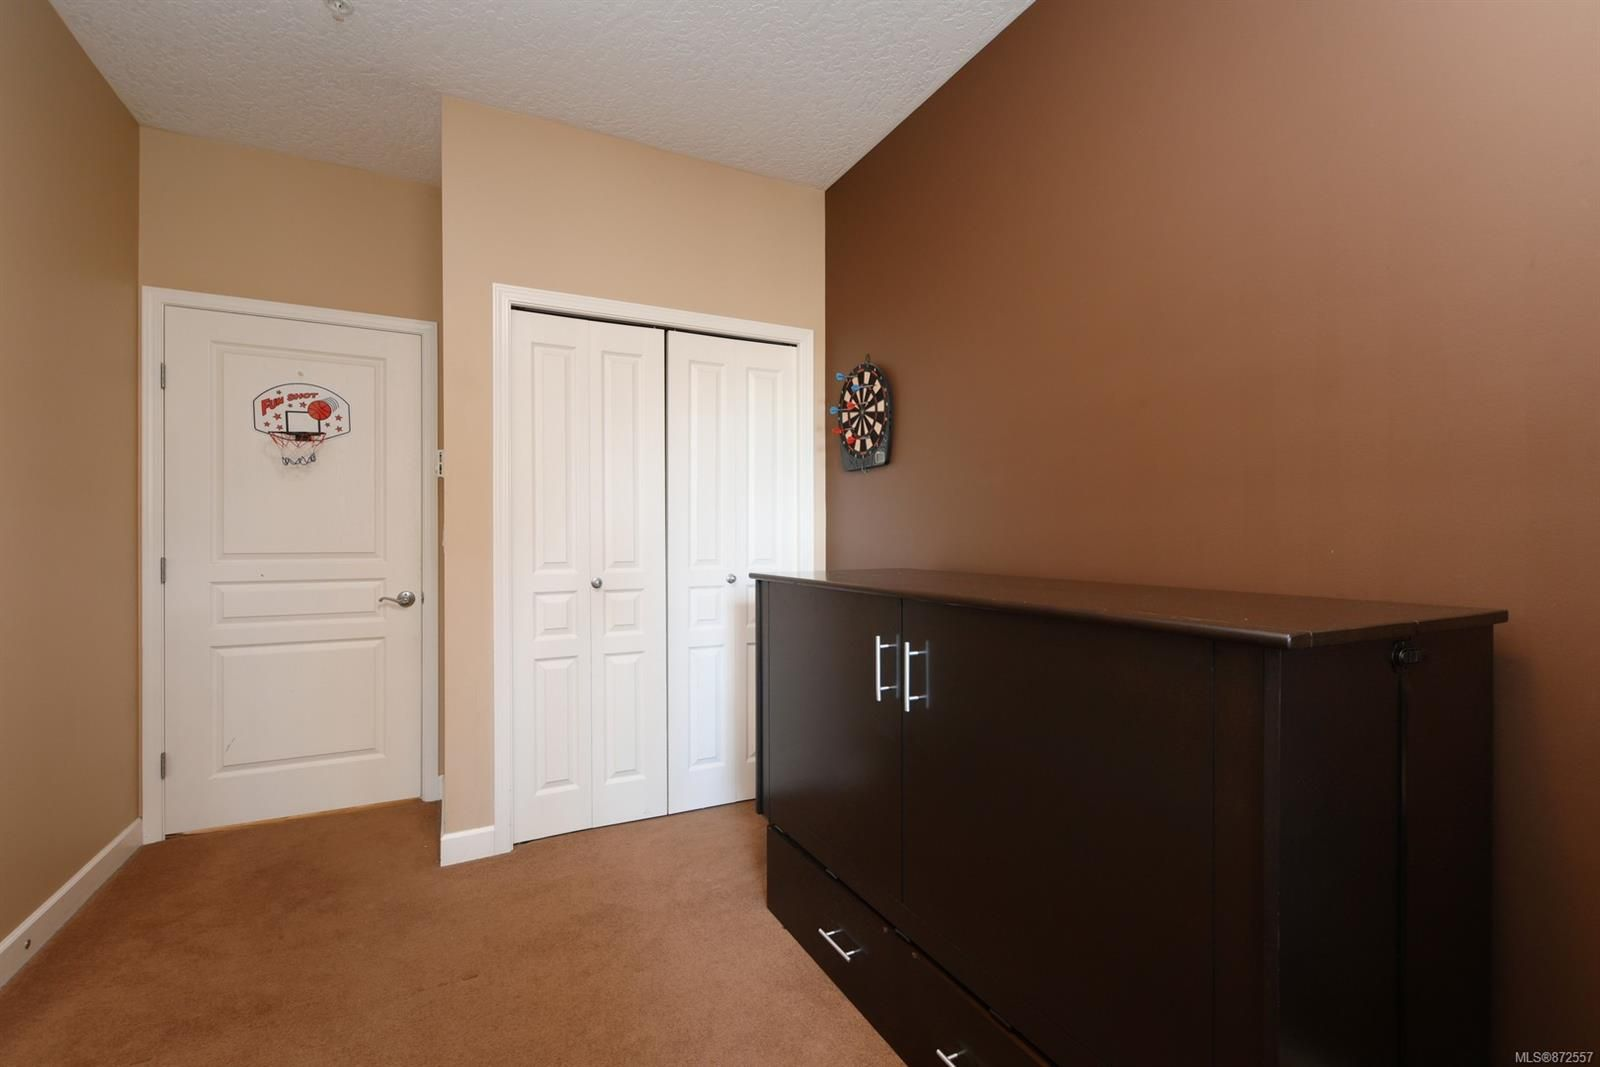 Photo 14: Photos: 411 825 Goldstream Ave in : La Langford Proper Condo for sale (Langford)  : MLS®# 872557